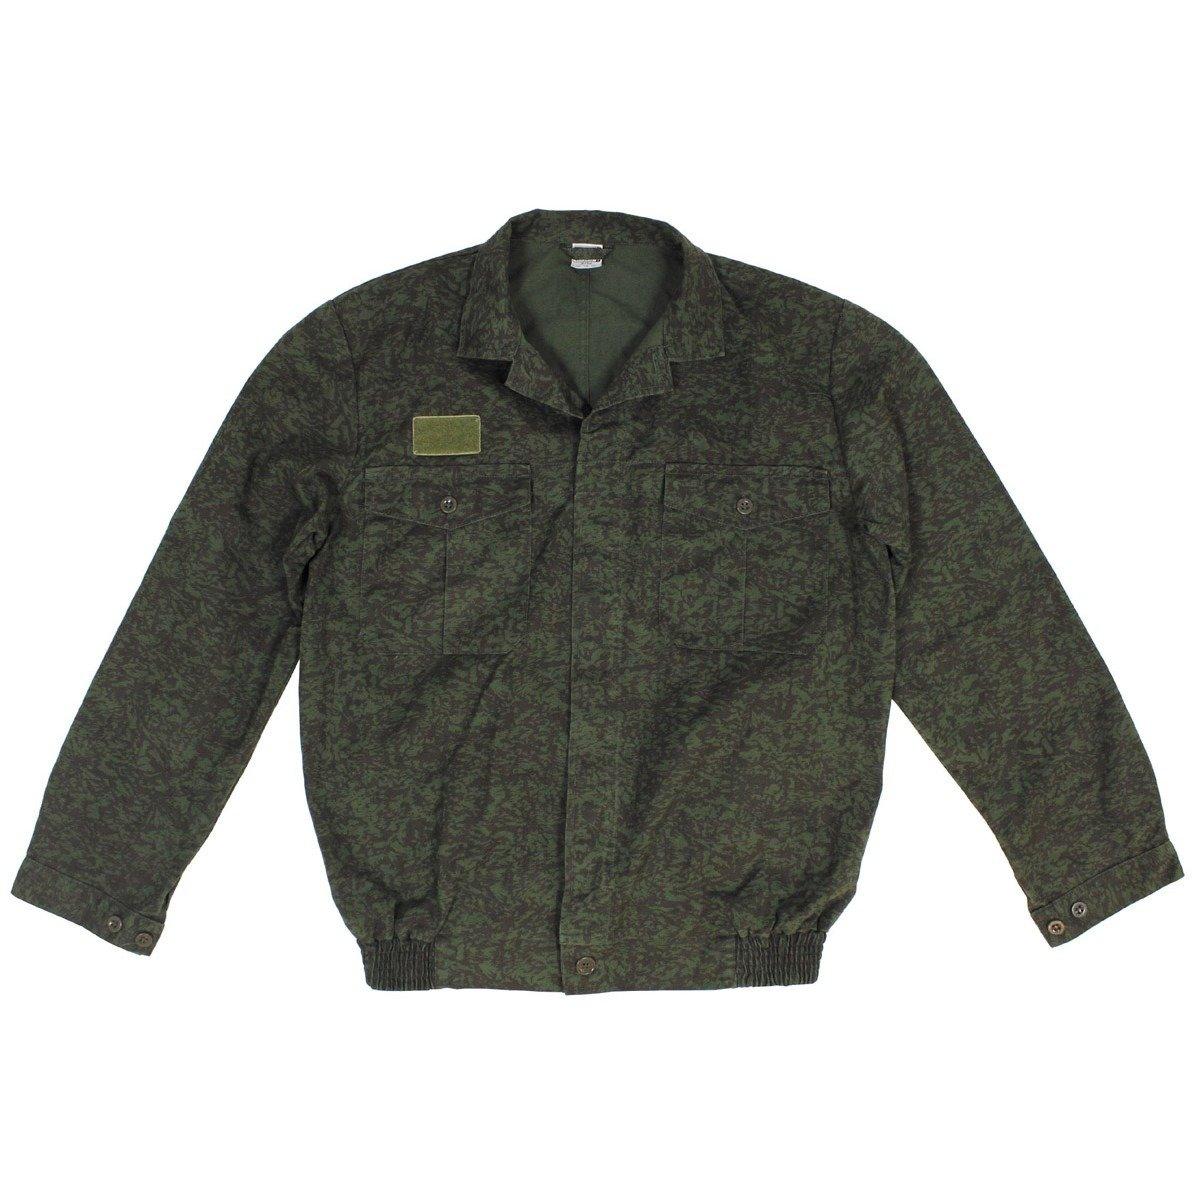 93faf45f4c9 CZ SK working jacket